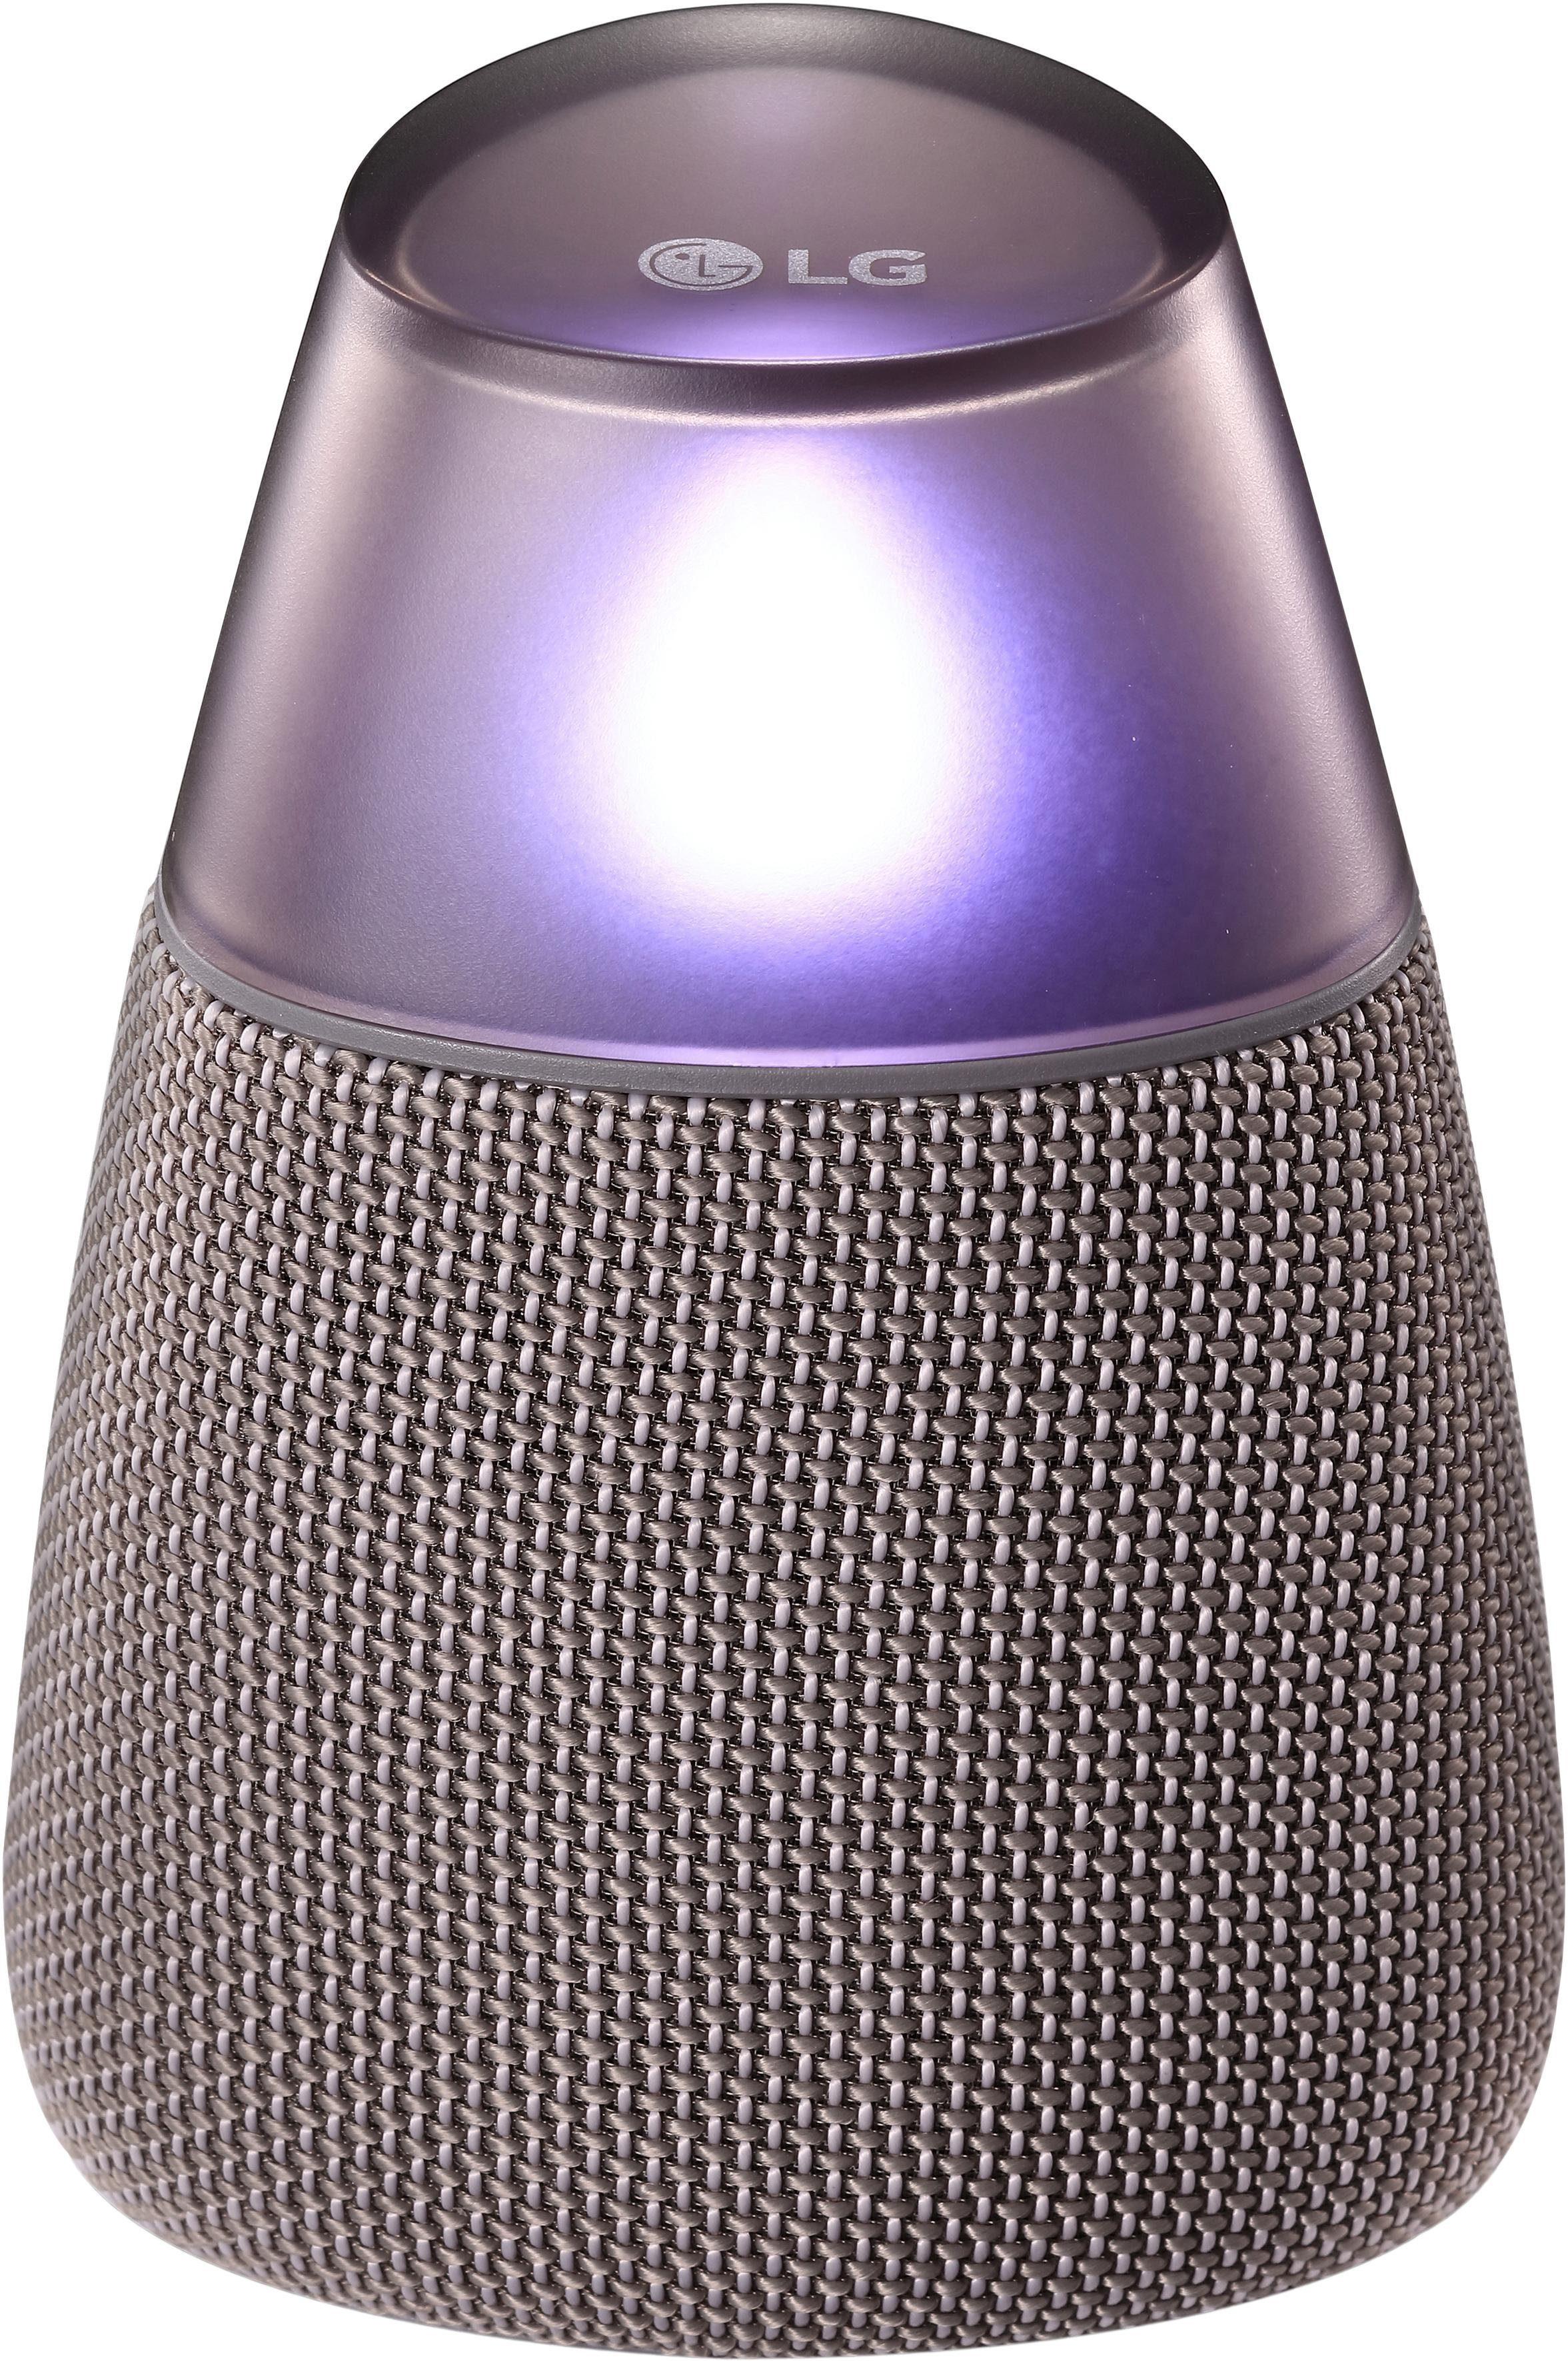 LG PH3G Portable-Lautsprecher (Bluetooth, 360 Grad Sound, Android und iPhone kompatibel via Bluetooth, Bass Boost Funktion, Mood Licht Funktion)